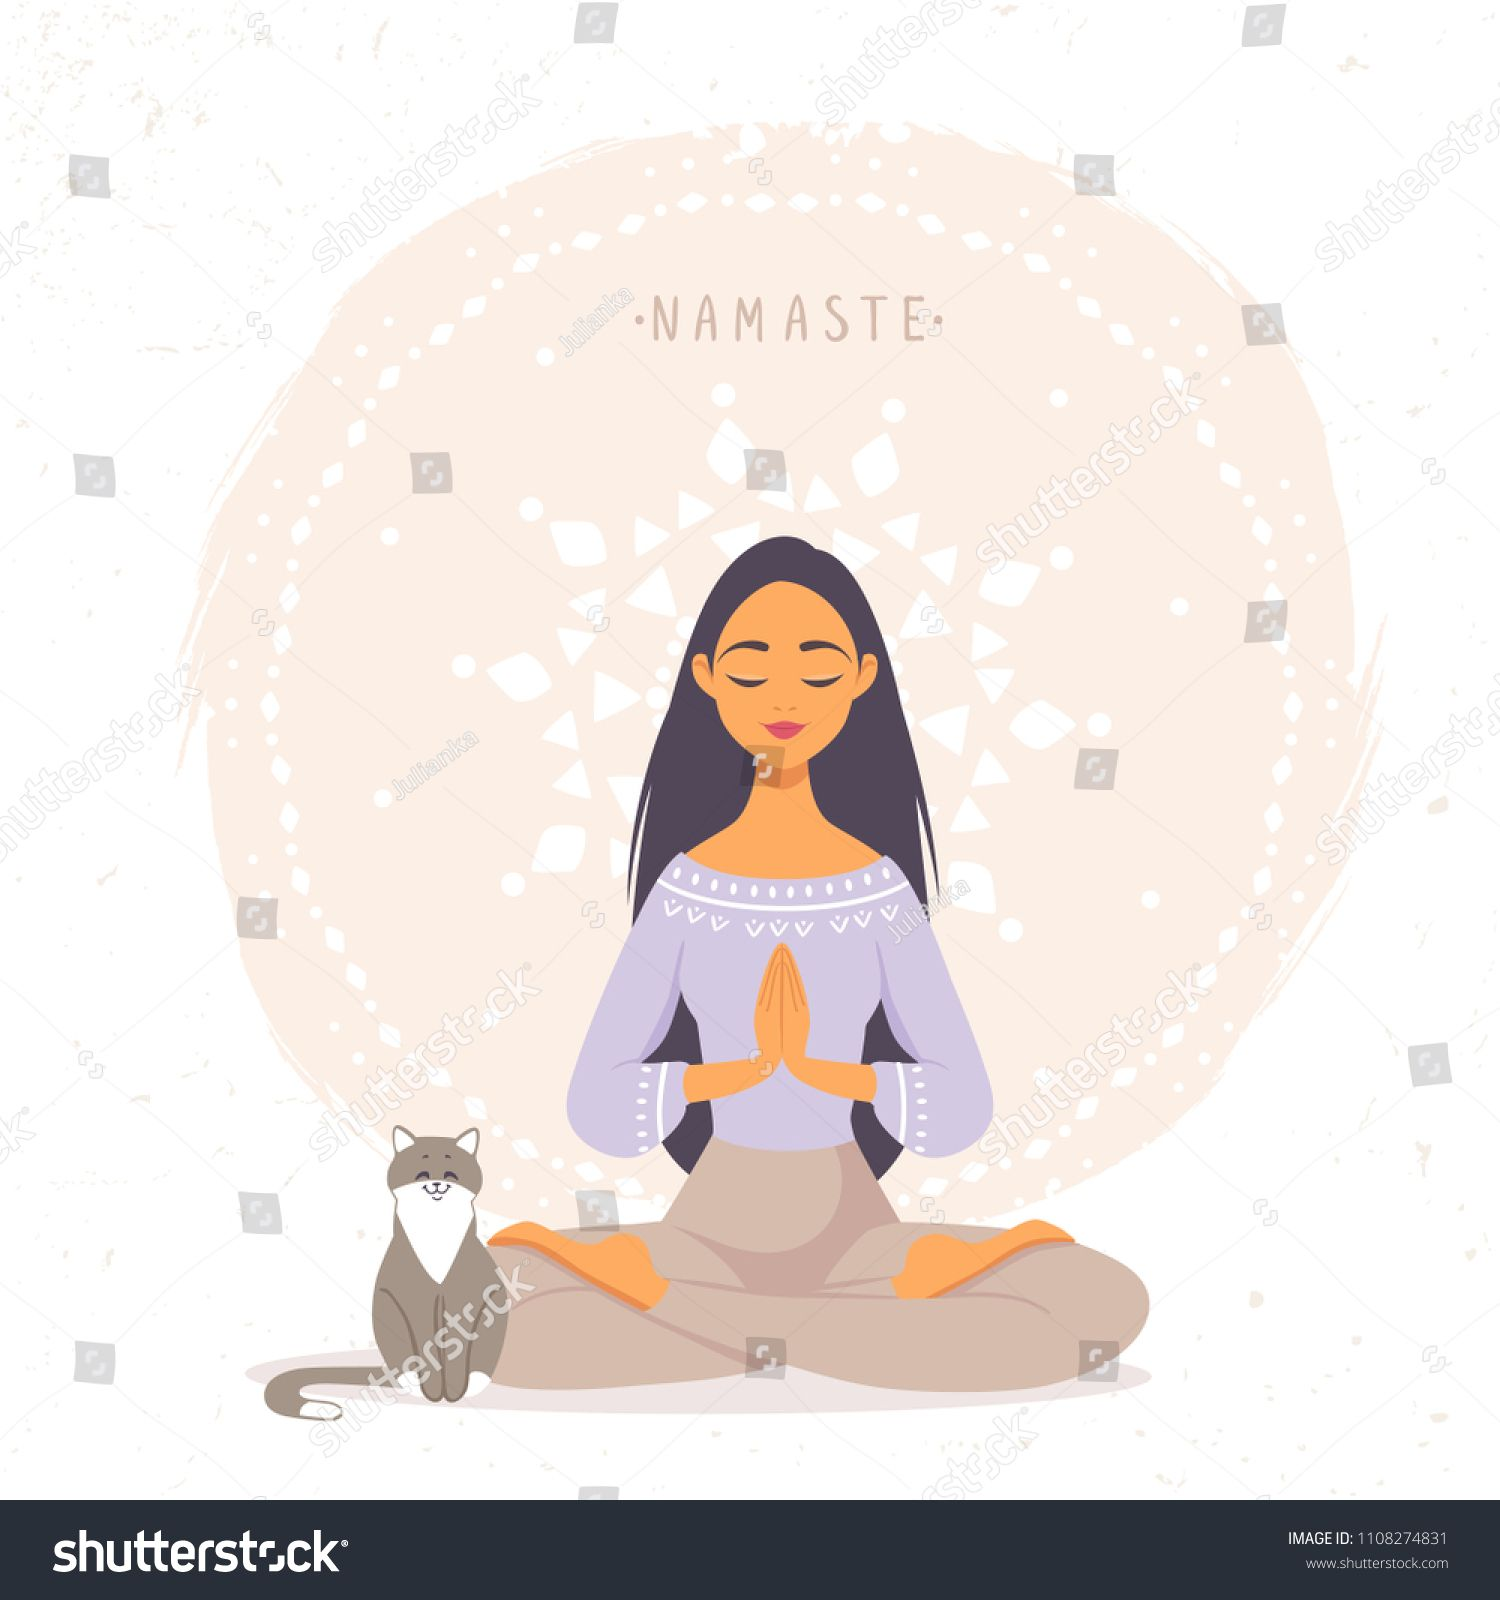 Amazing Cartoon Girl In Yoga Lotus Pose With Cute Cat Practicing Yoga Vector Illustration Young And Happy W Myltfilm Dlya Devochki Illyustracii Kartinki Jogi